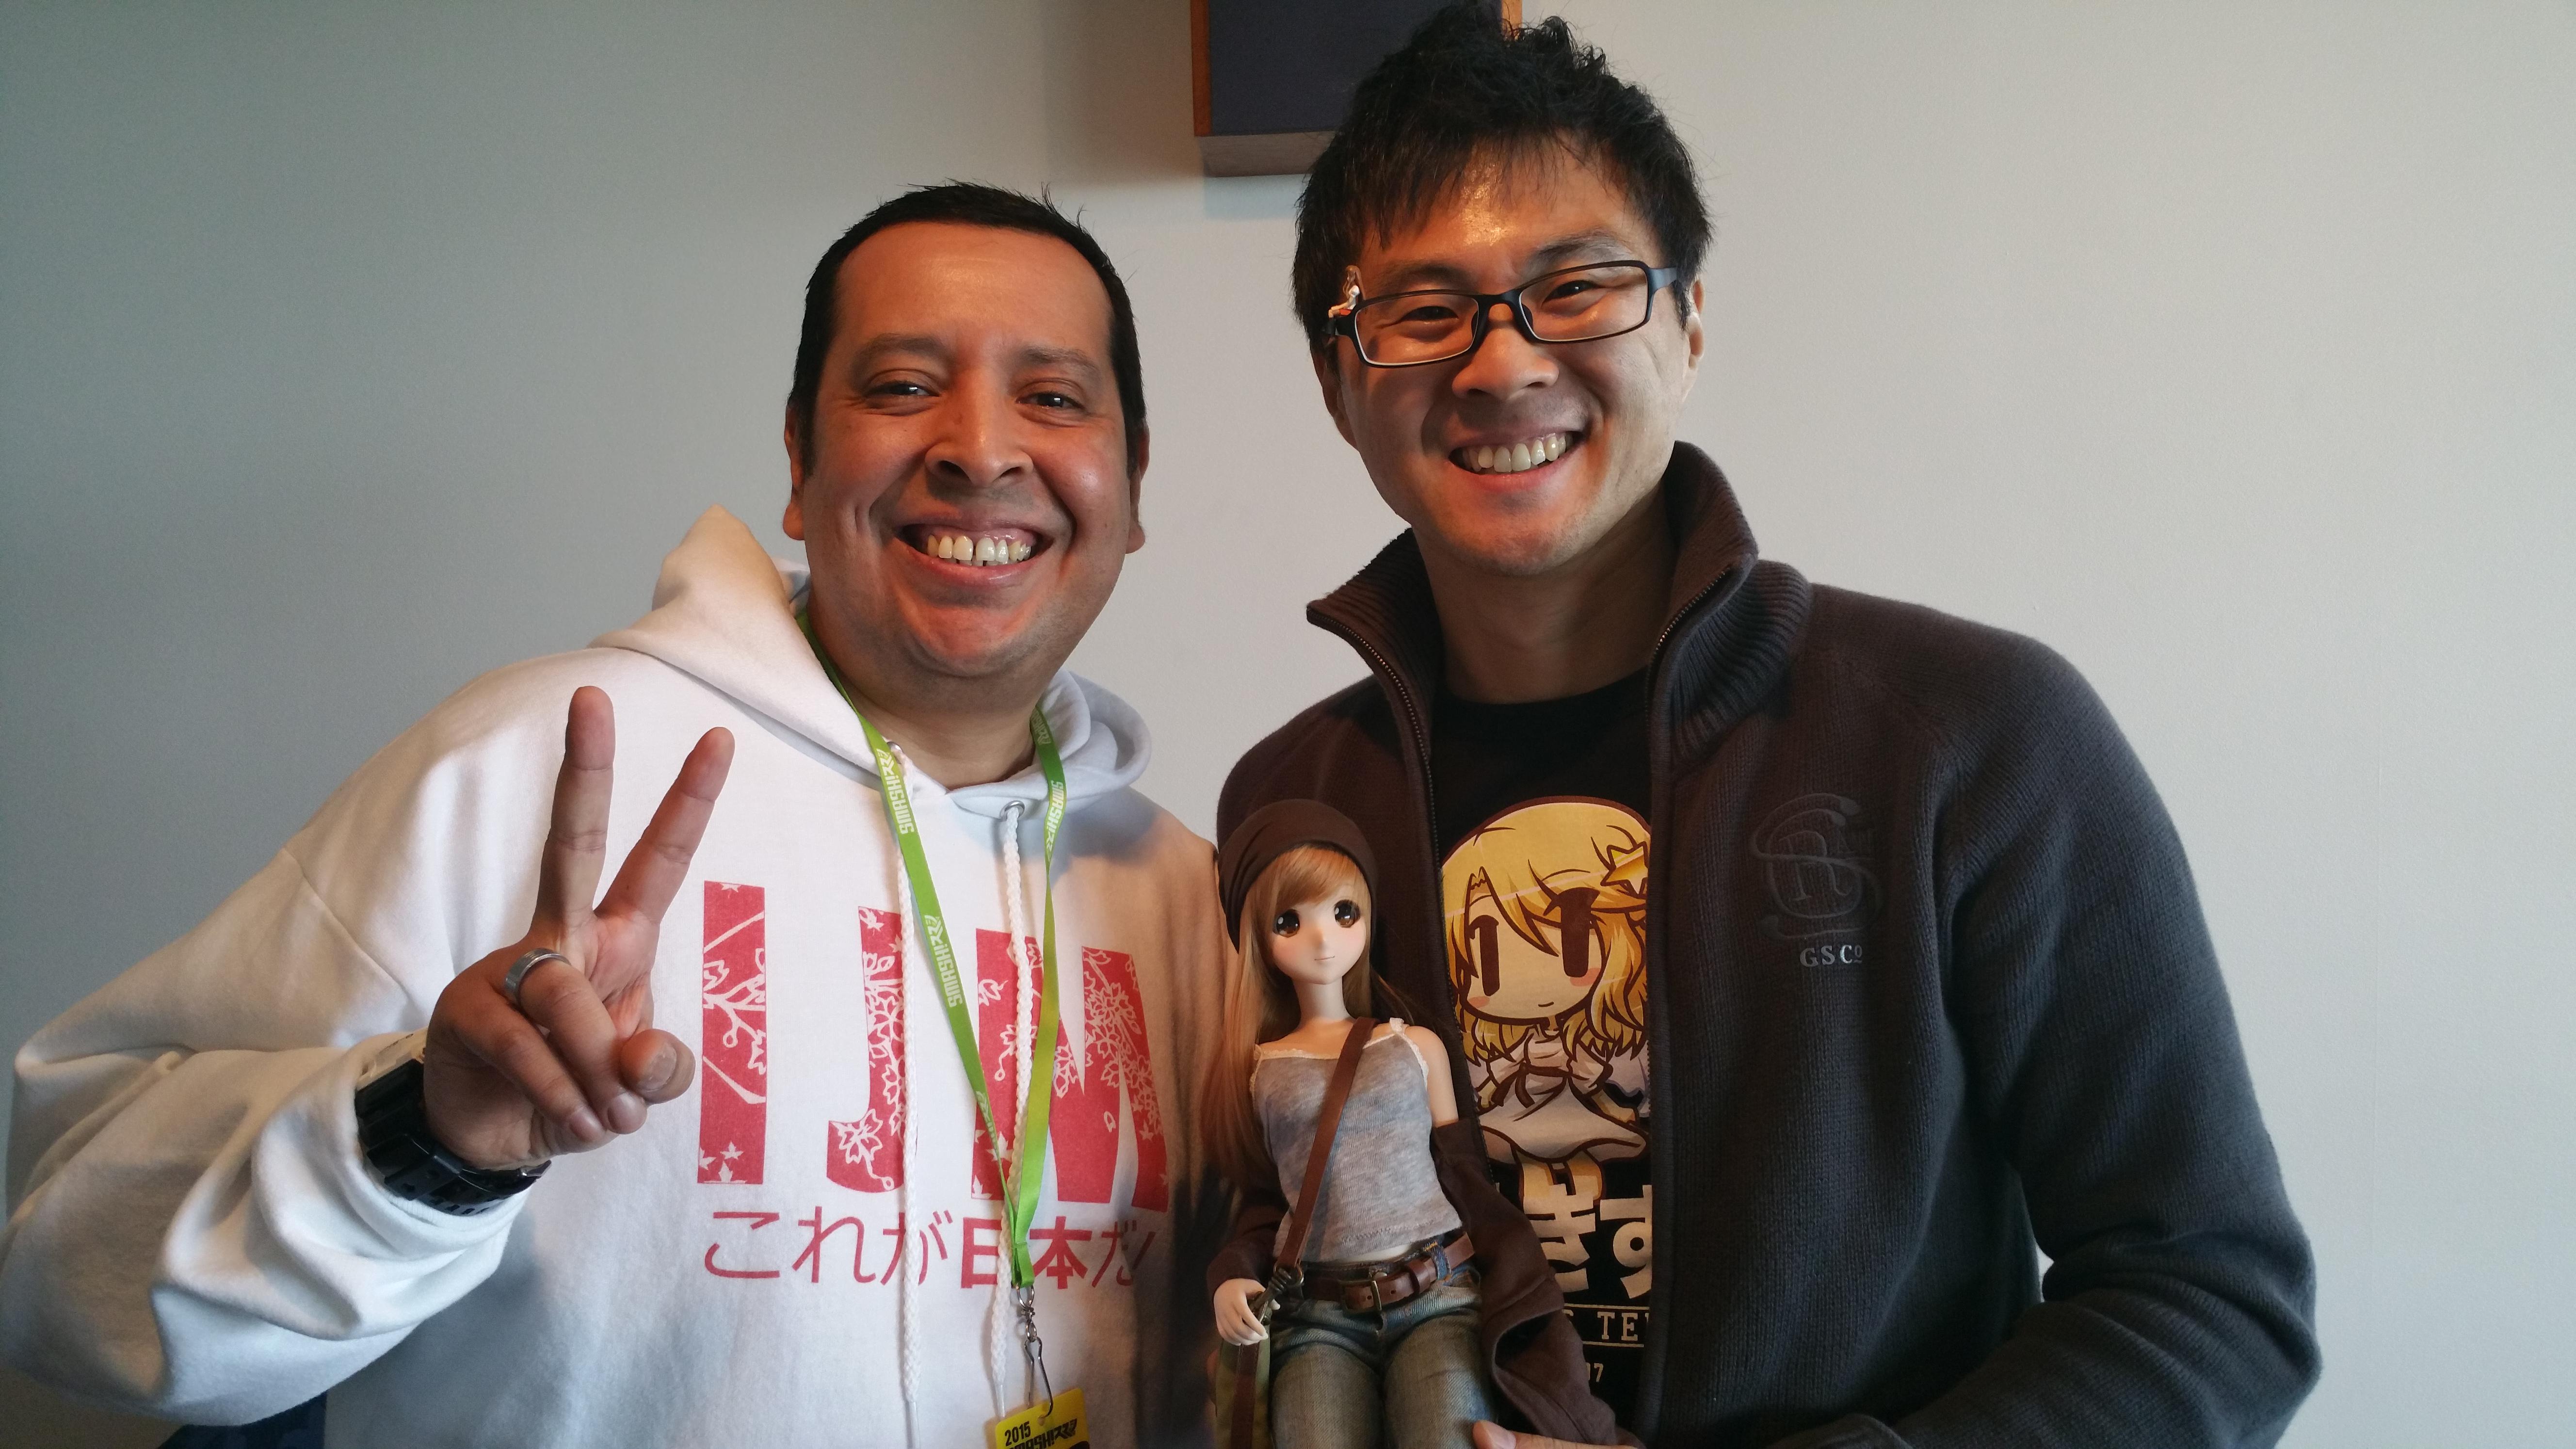 Meeting Danny Choo!